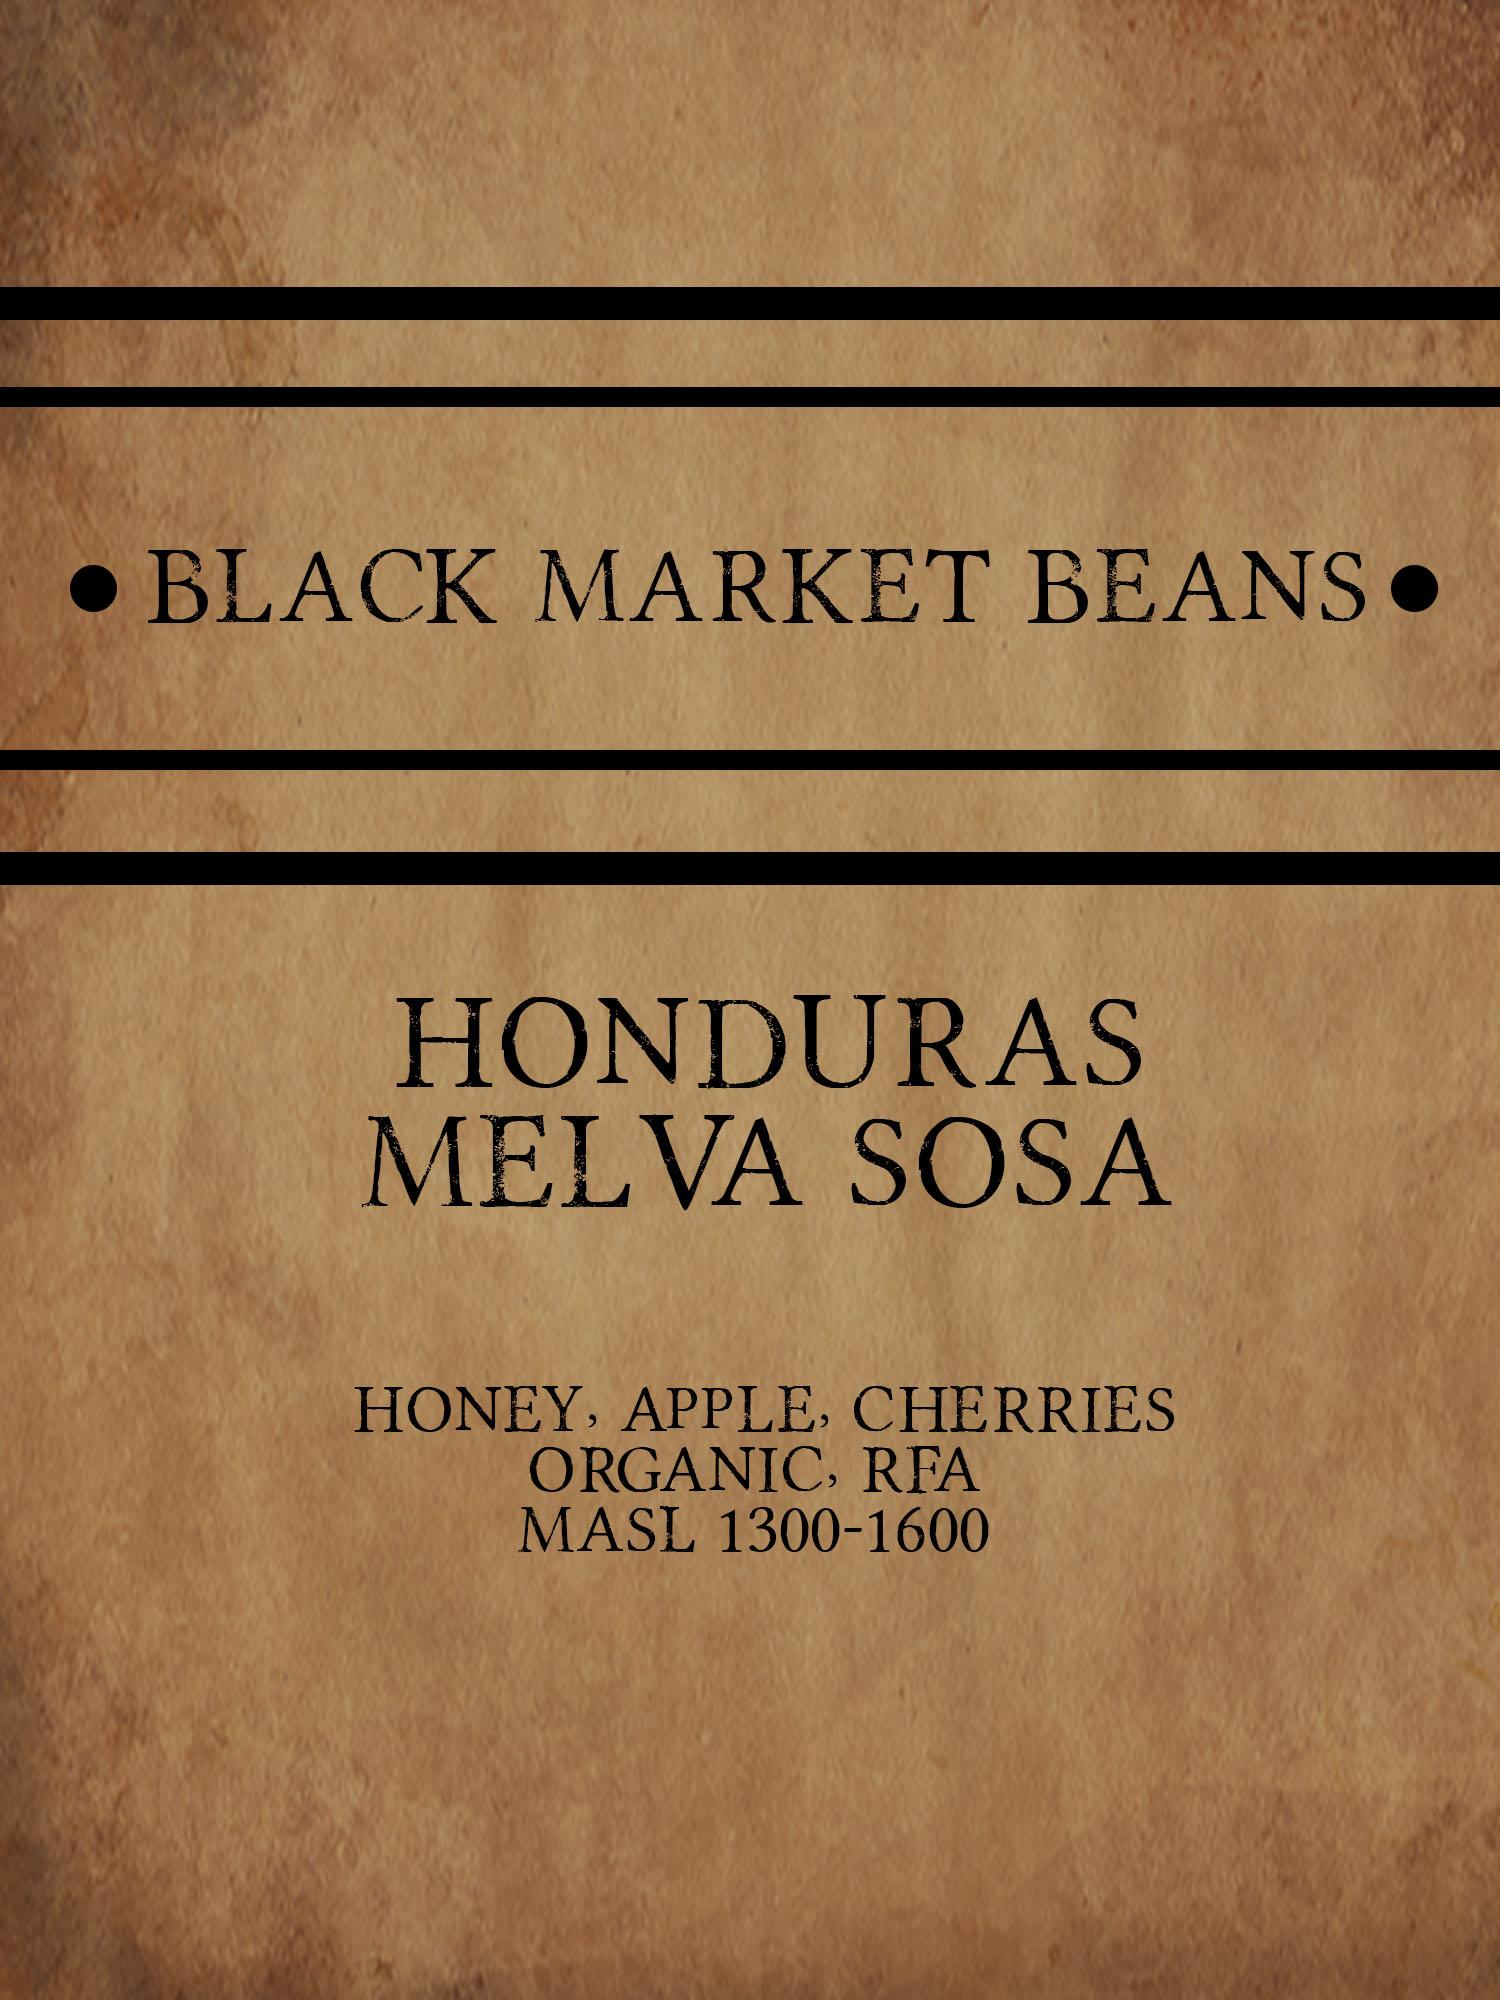 coffee_Honduras - Melva Sosa.jpg